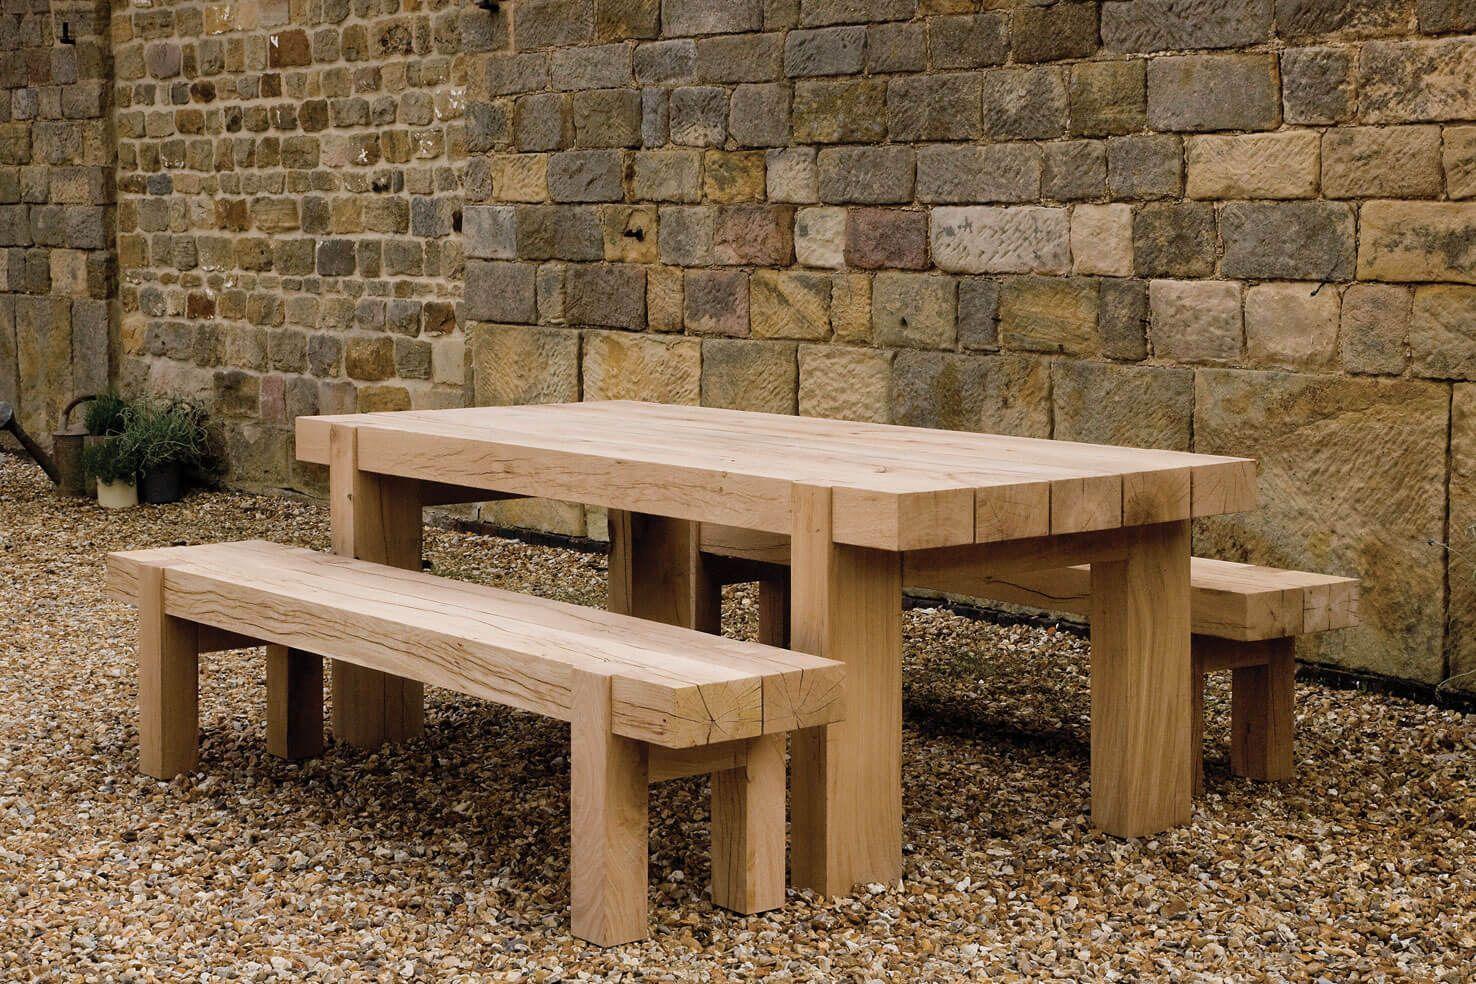 Outdoor Oak Bench Handcrafted By Indigo Furniture Wooden Garden Furniture Chunky Wooden Garden Furniture Indigo Furniture